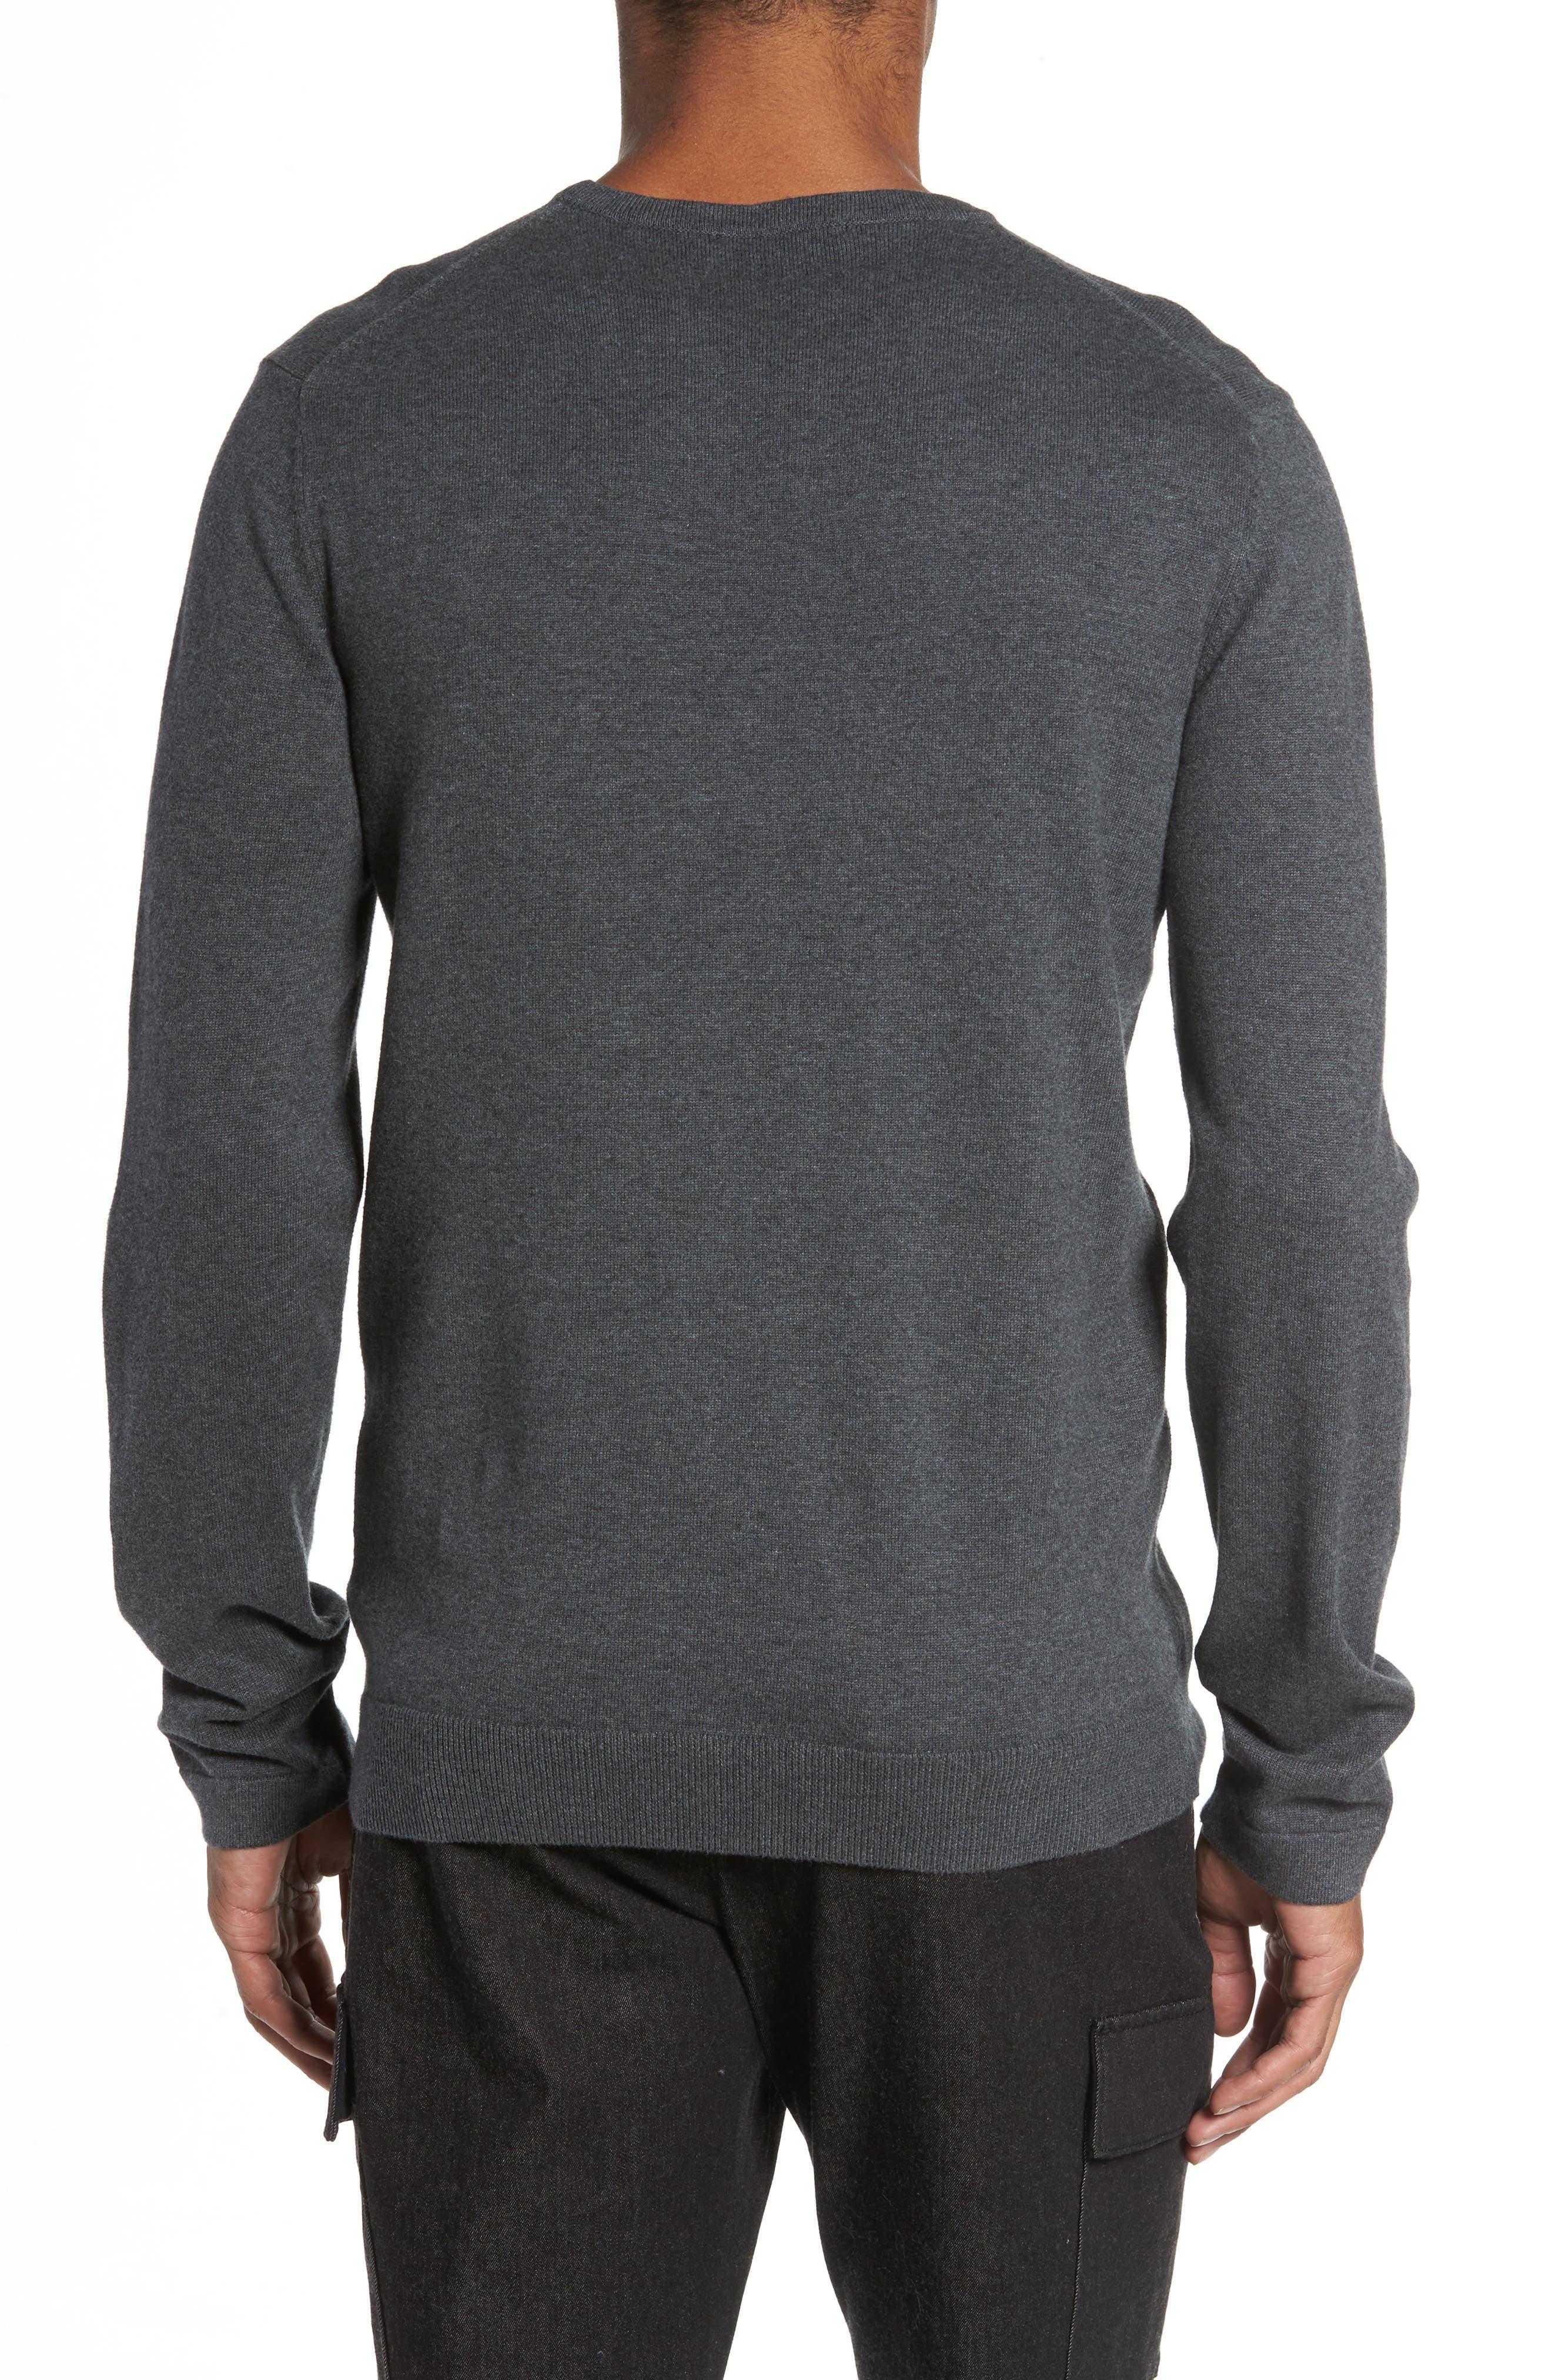 Milano Front Regular Fit Cotton Sweater,                             Alternate thumbnail 2, color,                             CHARCOAL MELANGE